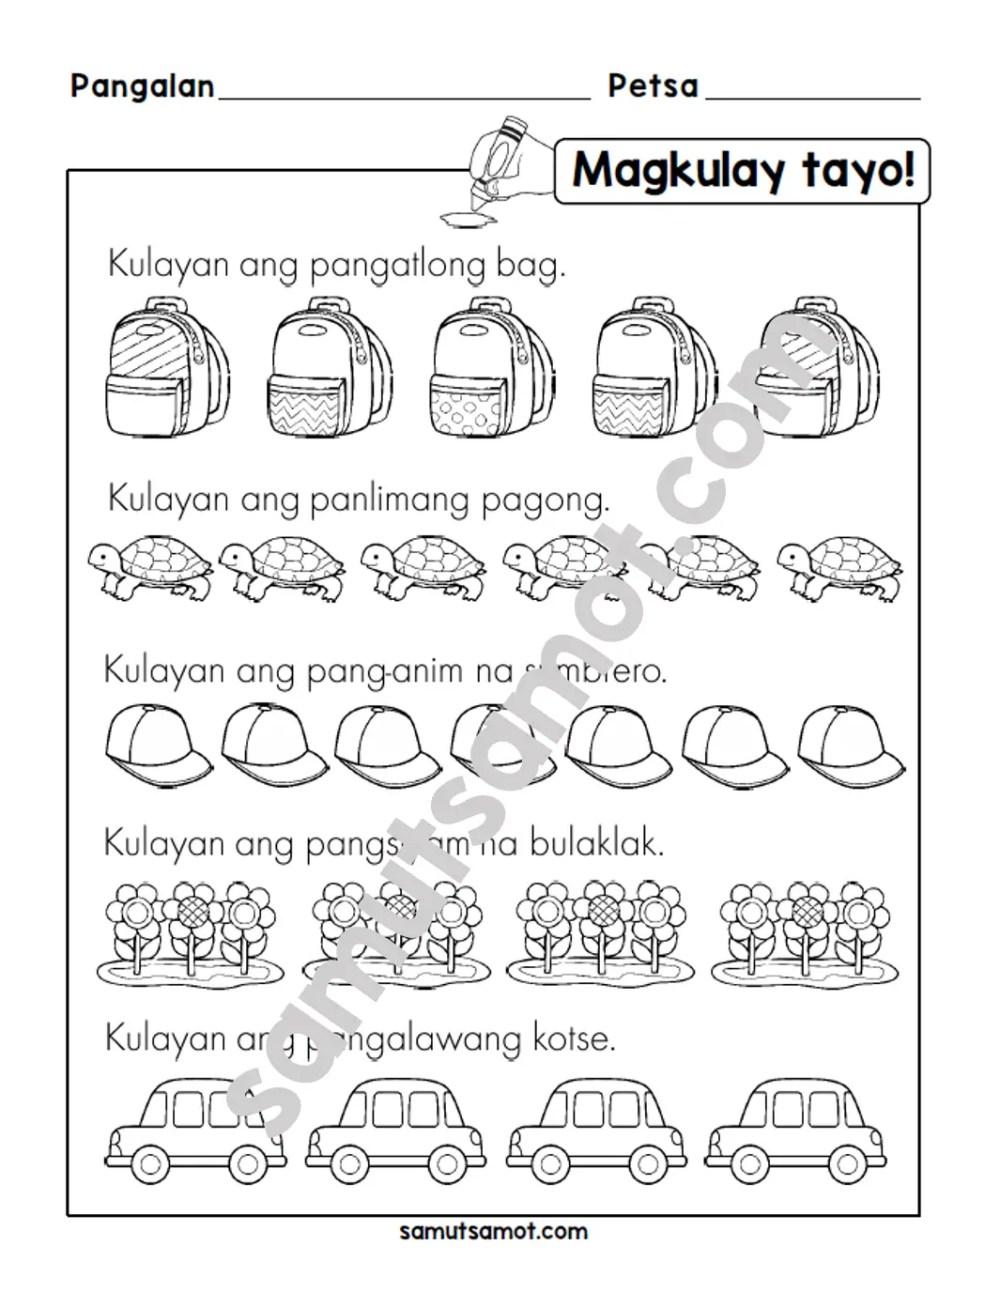 medium resolution of Mga Ordinal Worksheets - Samut-samot